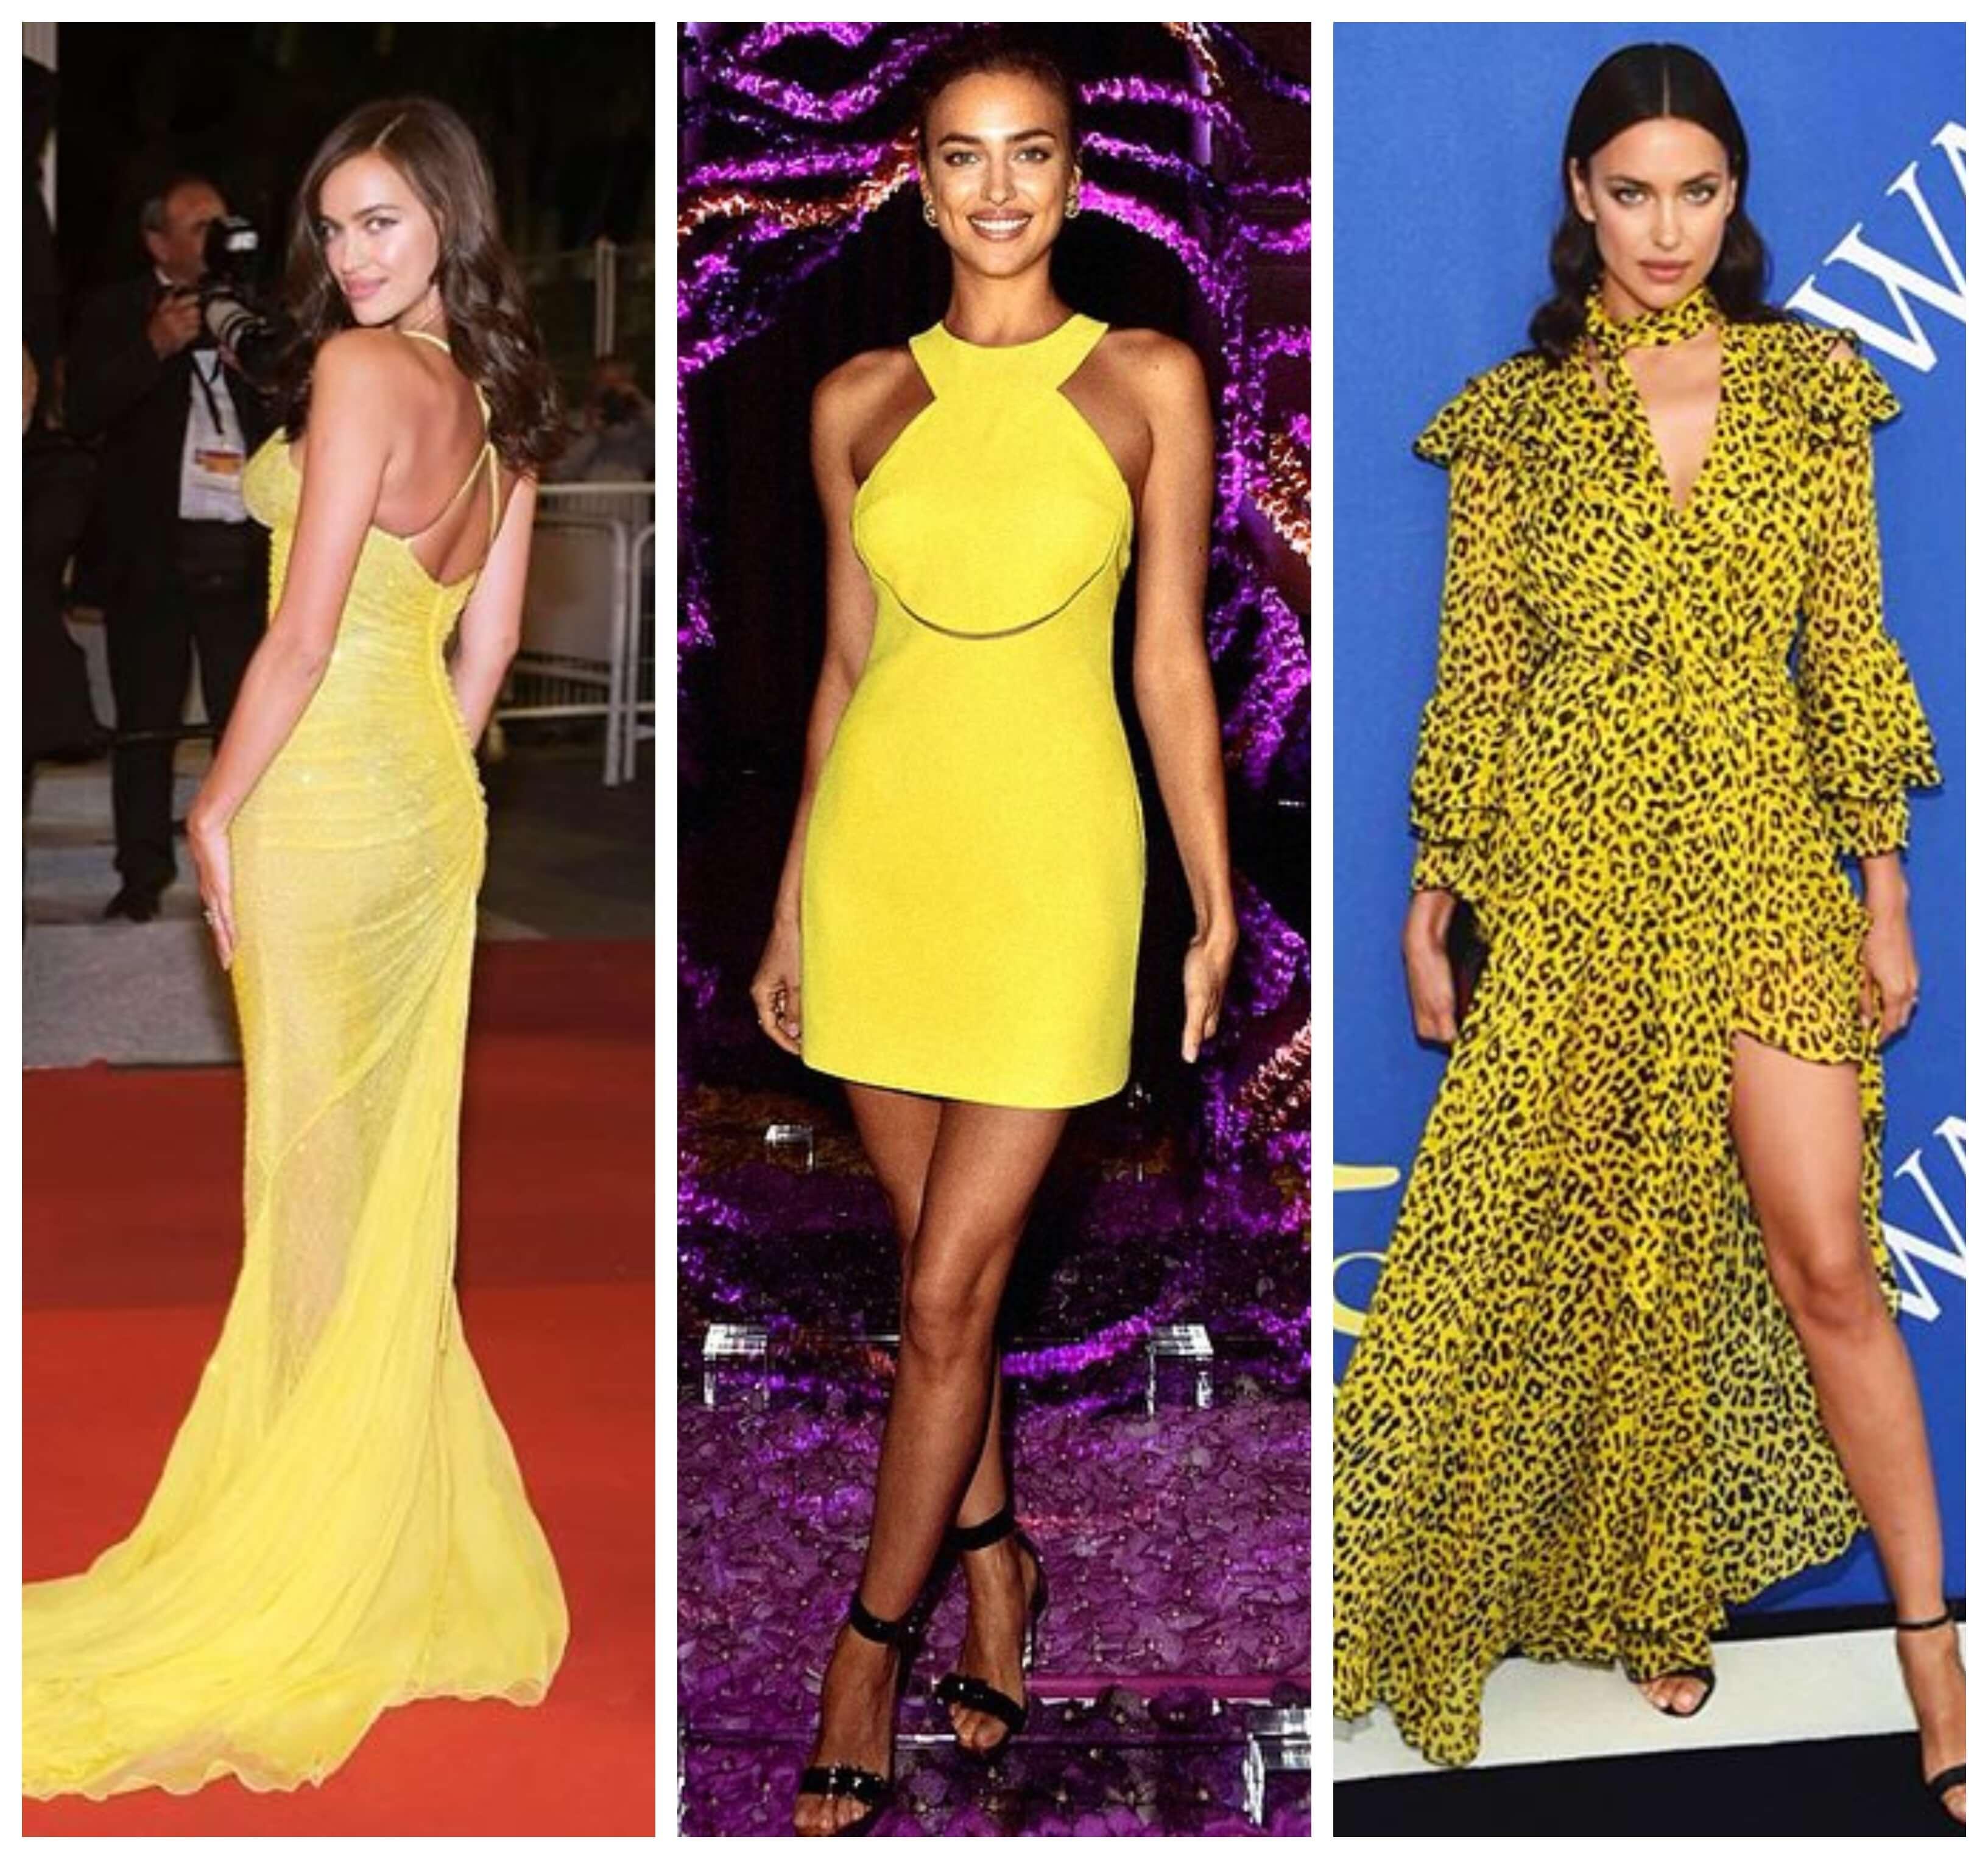 La supermodelo rusa con vestidos amarillos.